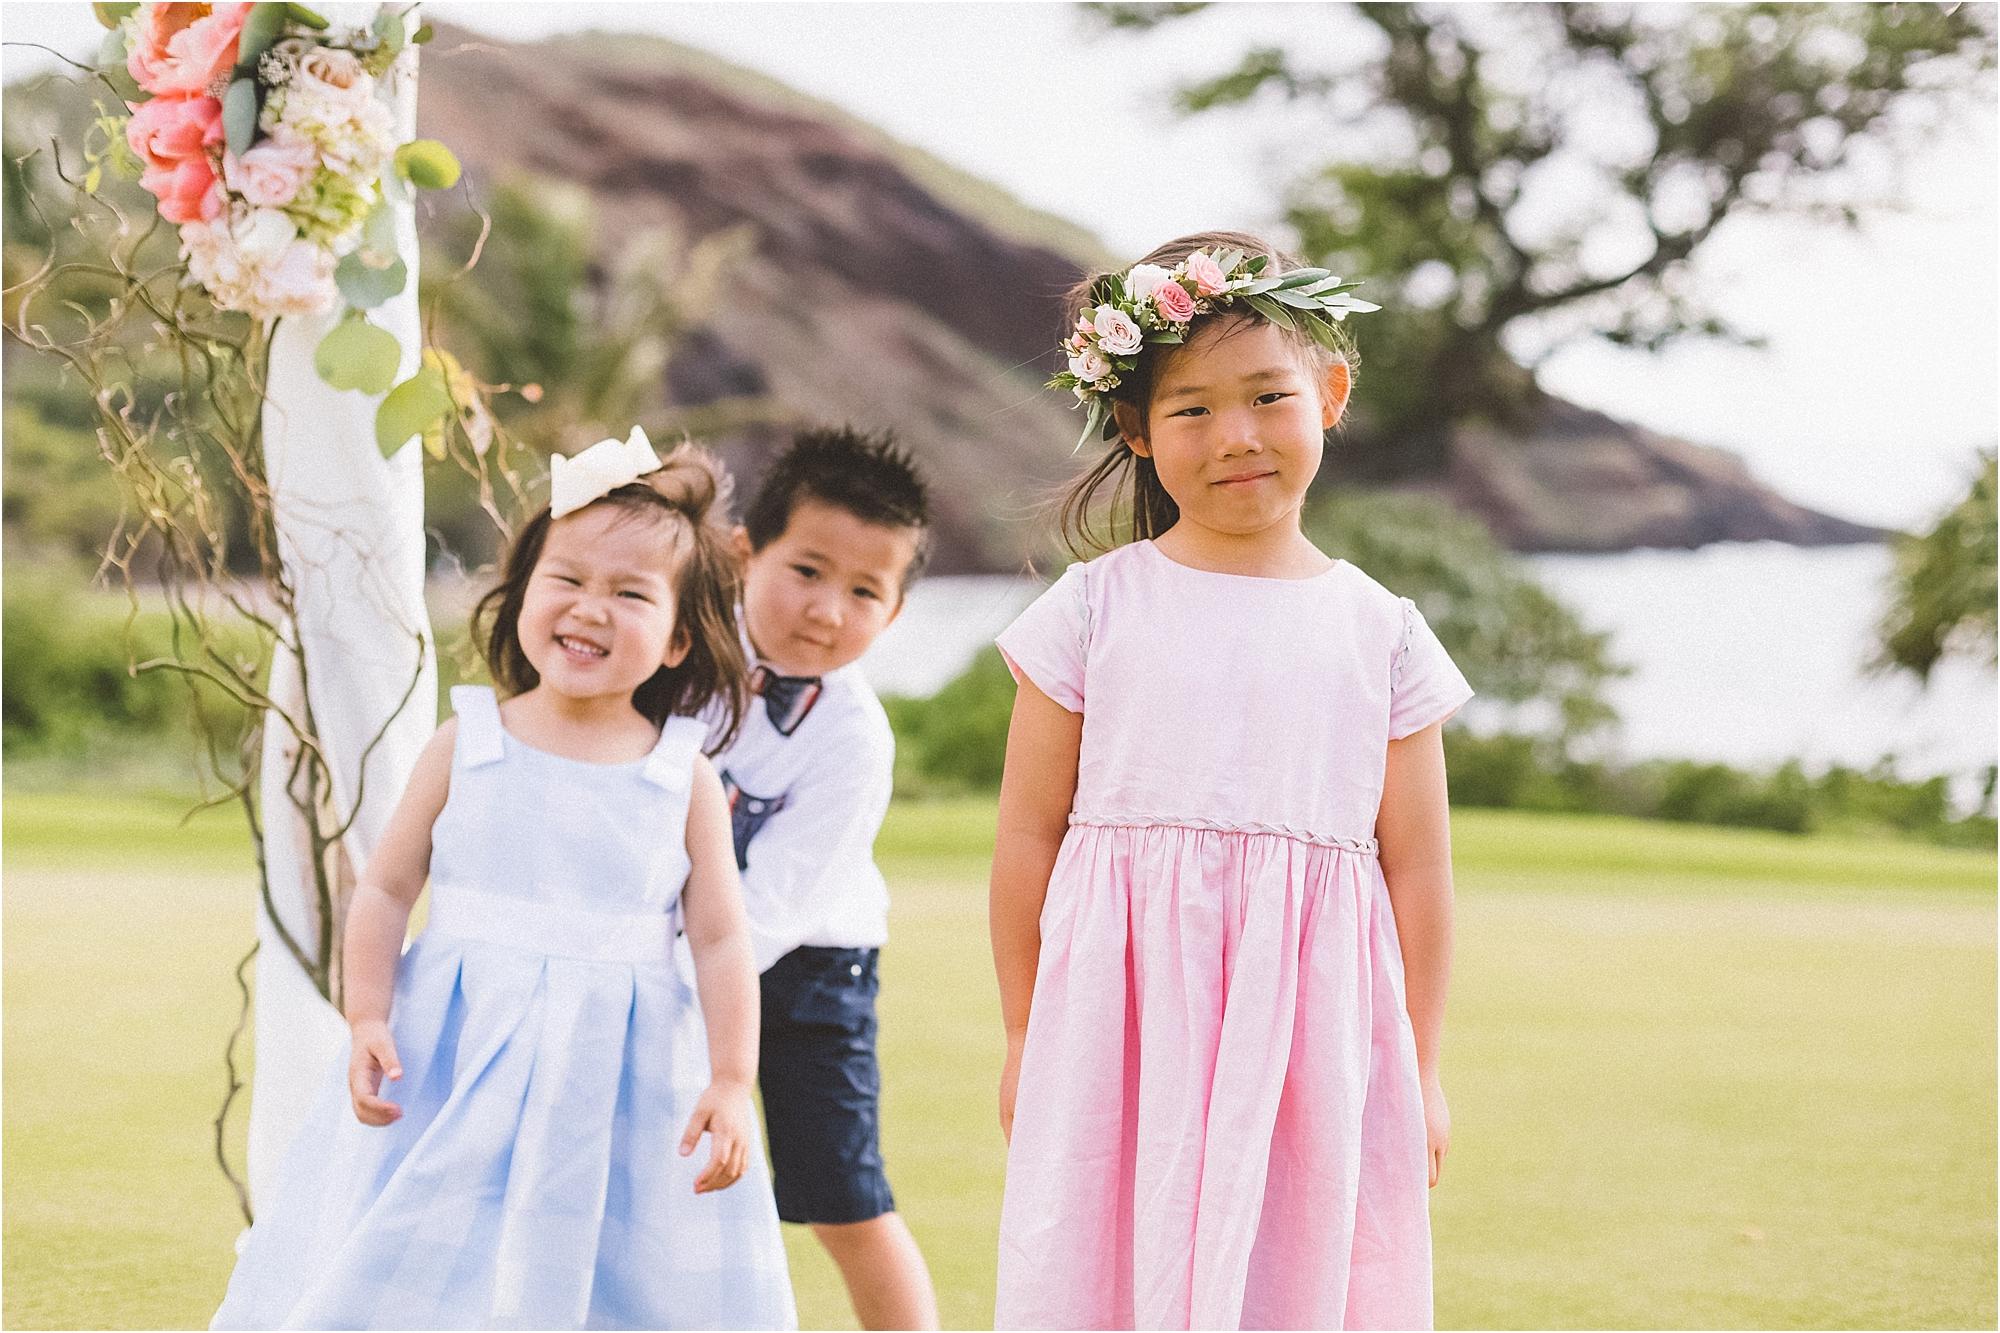 angie-diaz-photography-maui-hawaii-destination-wedding-makena-golf-beach-club_0017.jpg